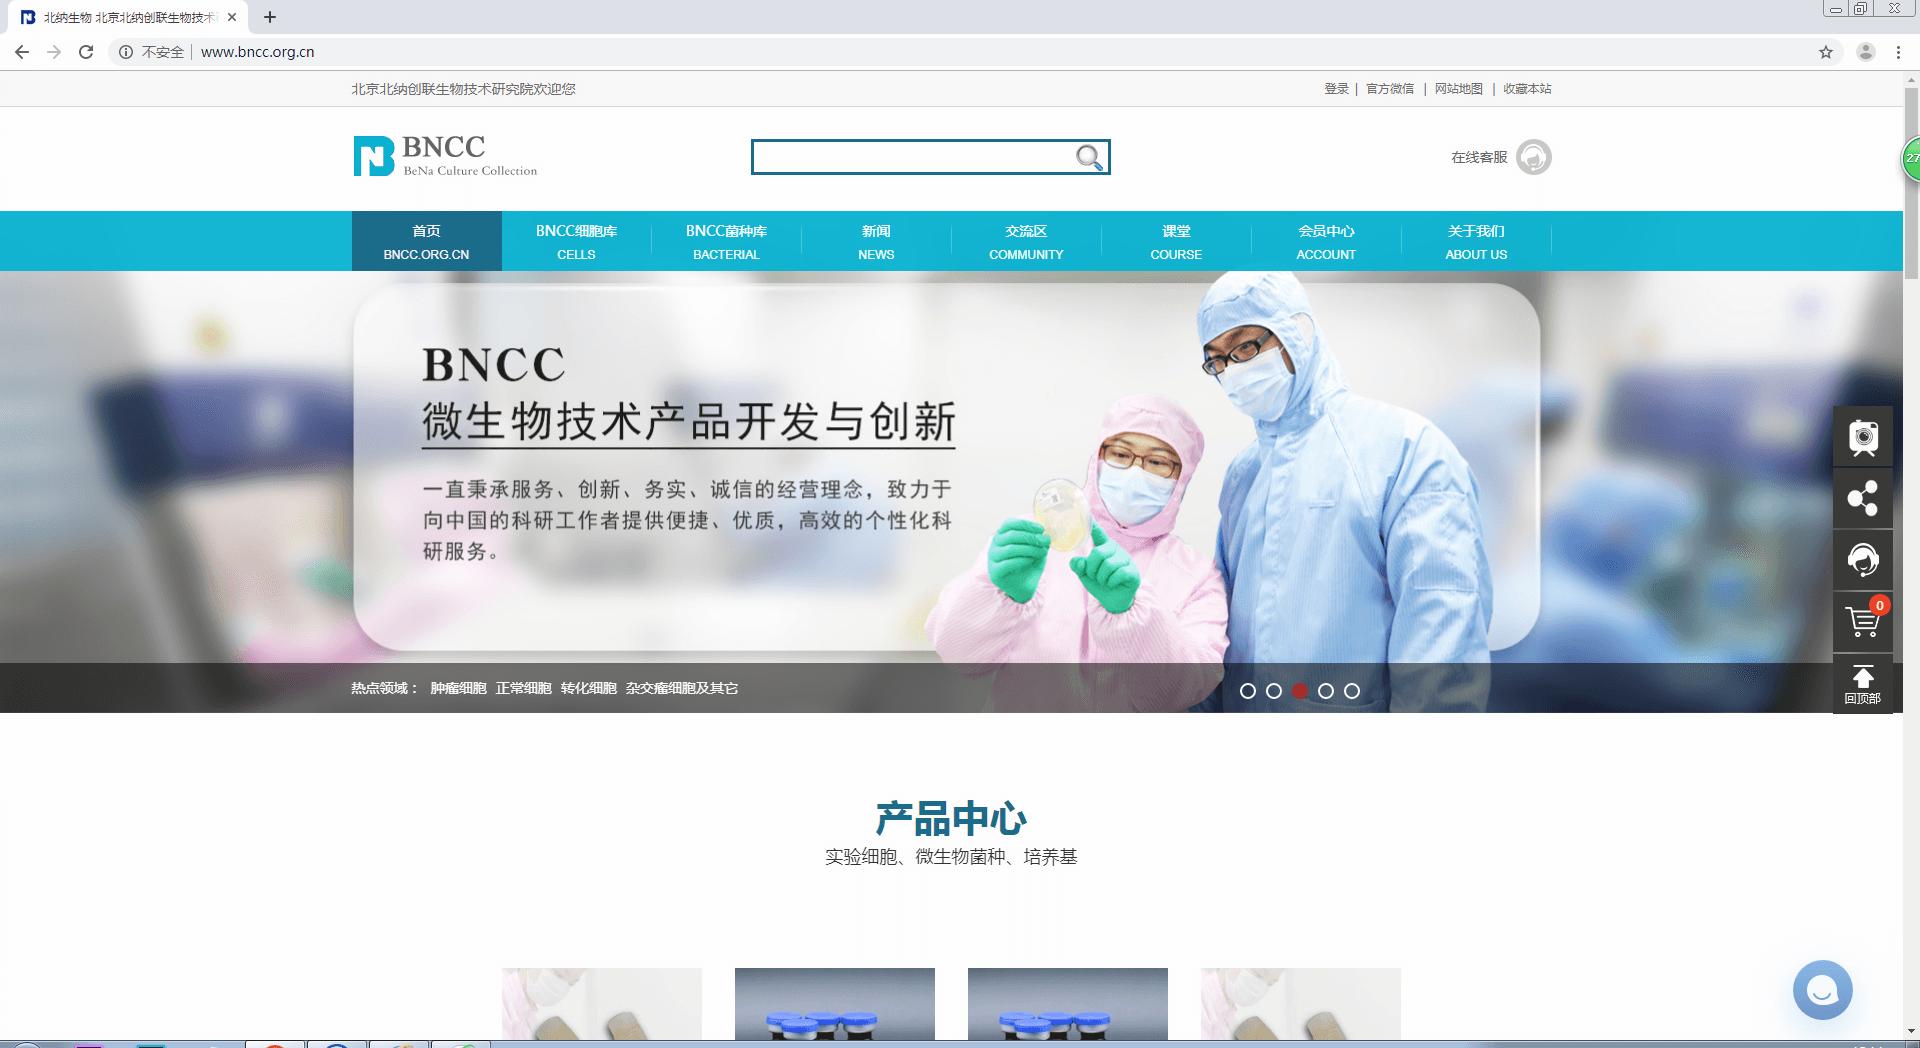 BNCC网站全新改版-www.biaowu.com